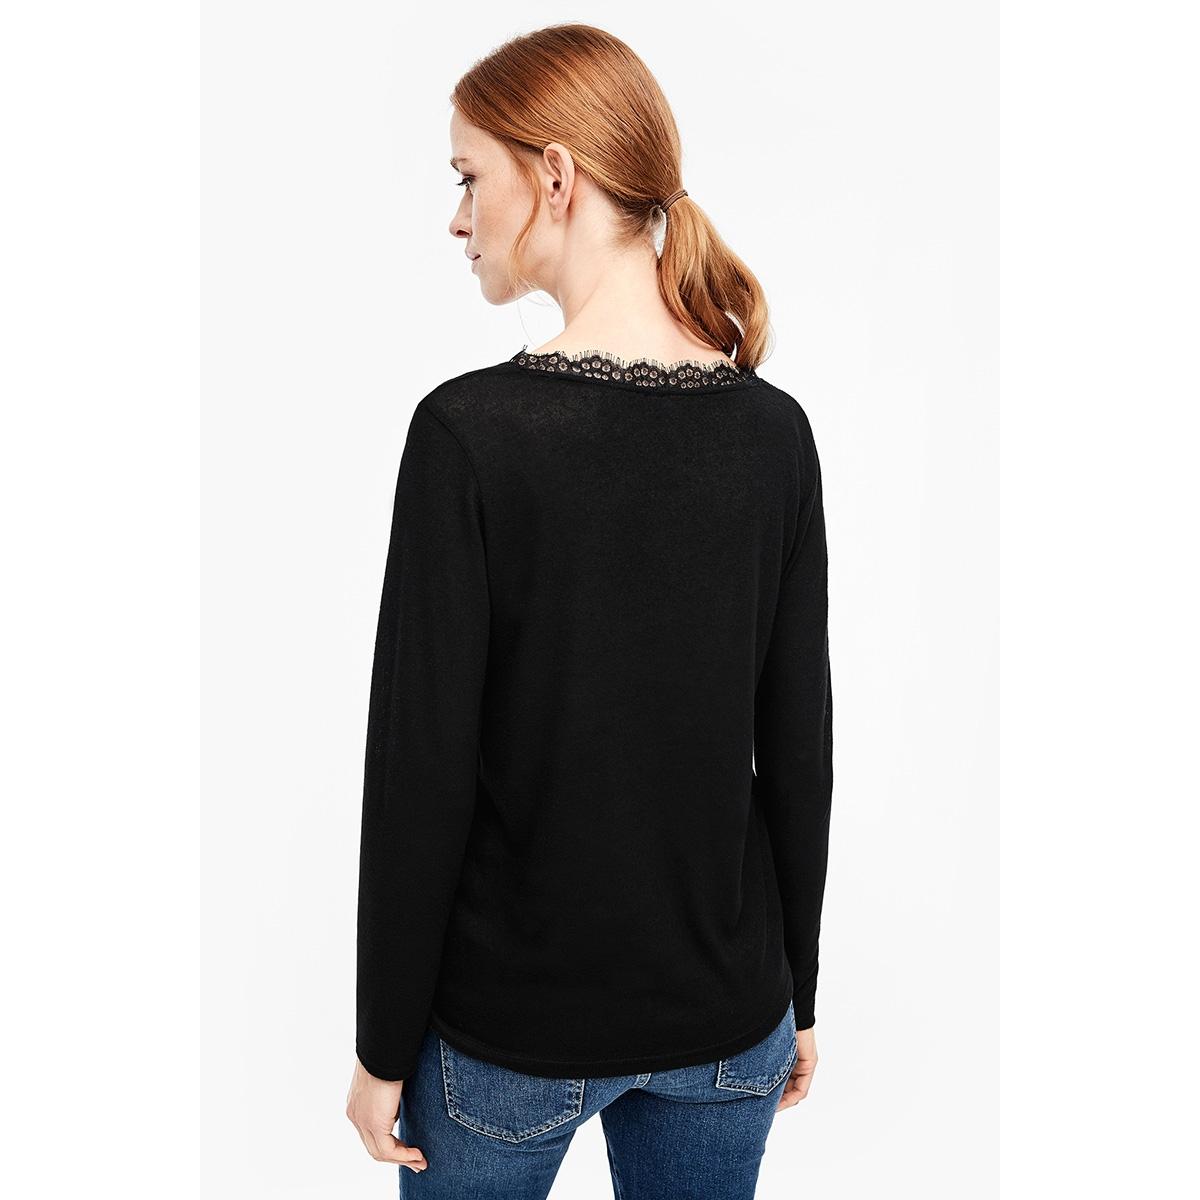 longsleeve 05912316893 s.oliver t-shirt 9999